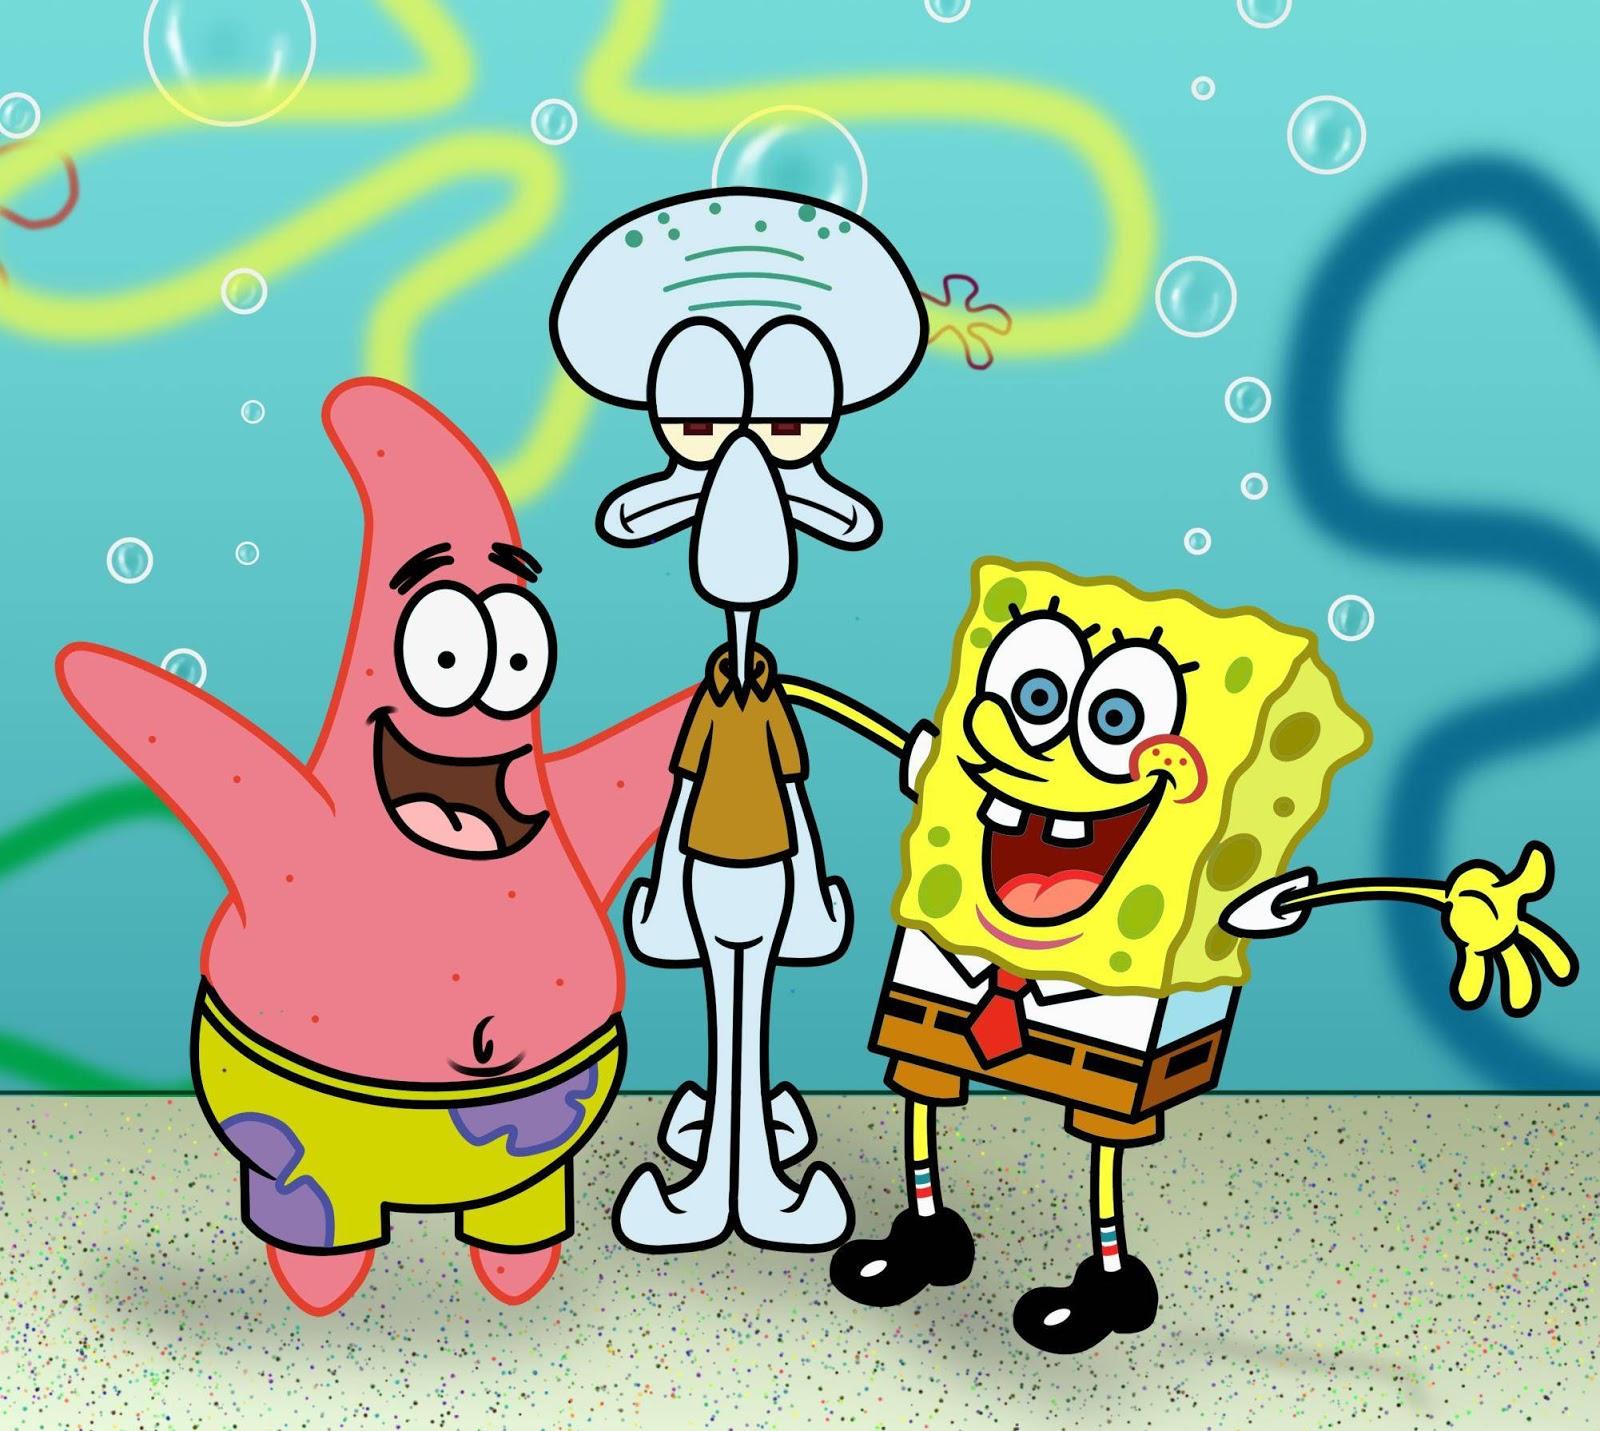 American top cartoons: Spongebob and patrick